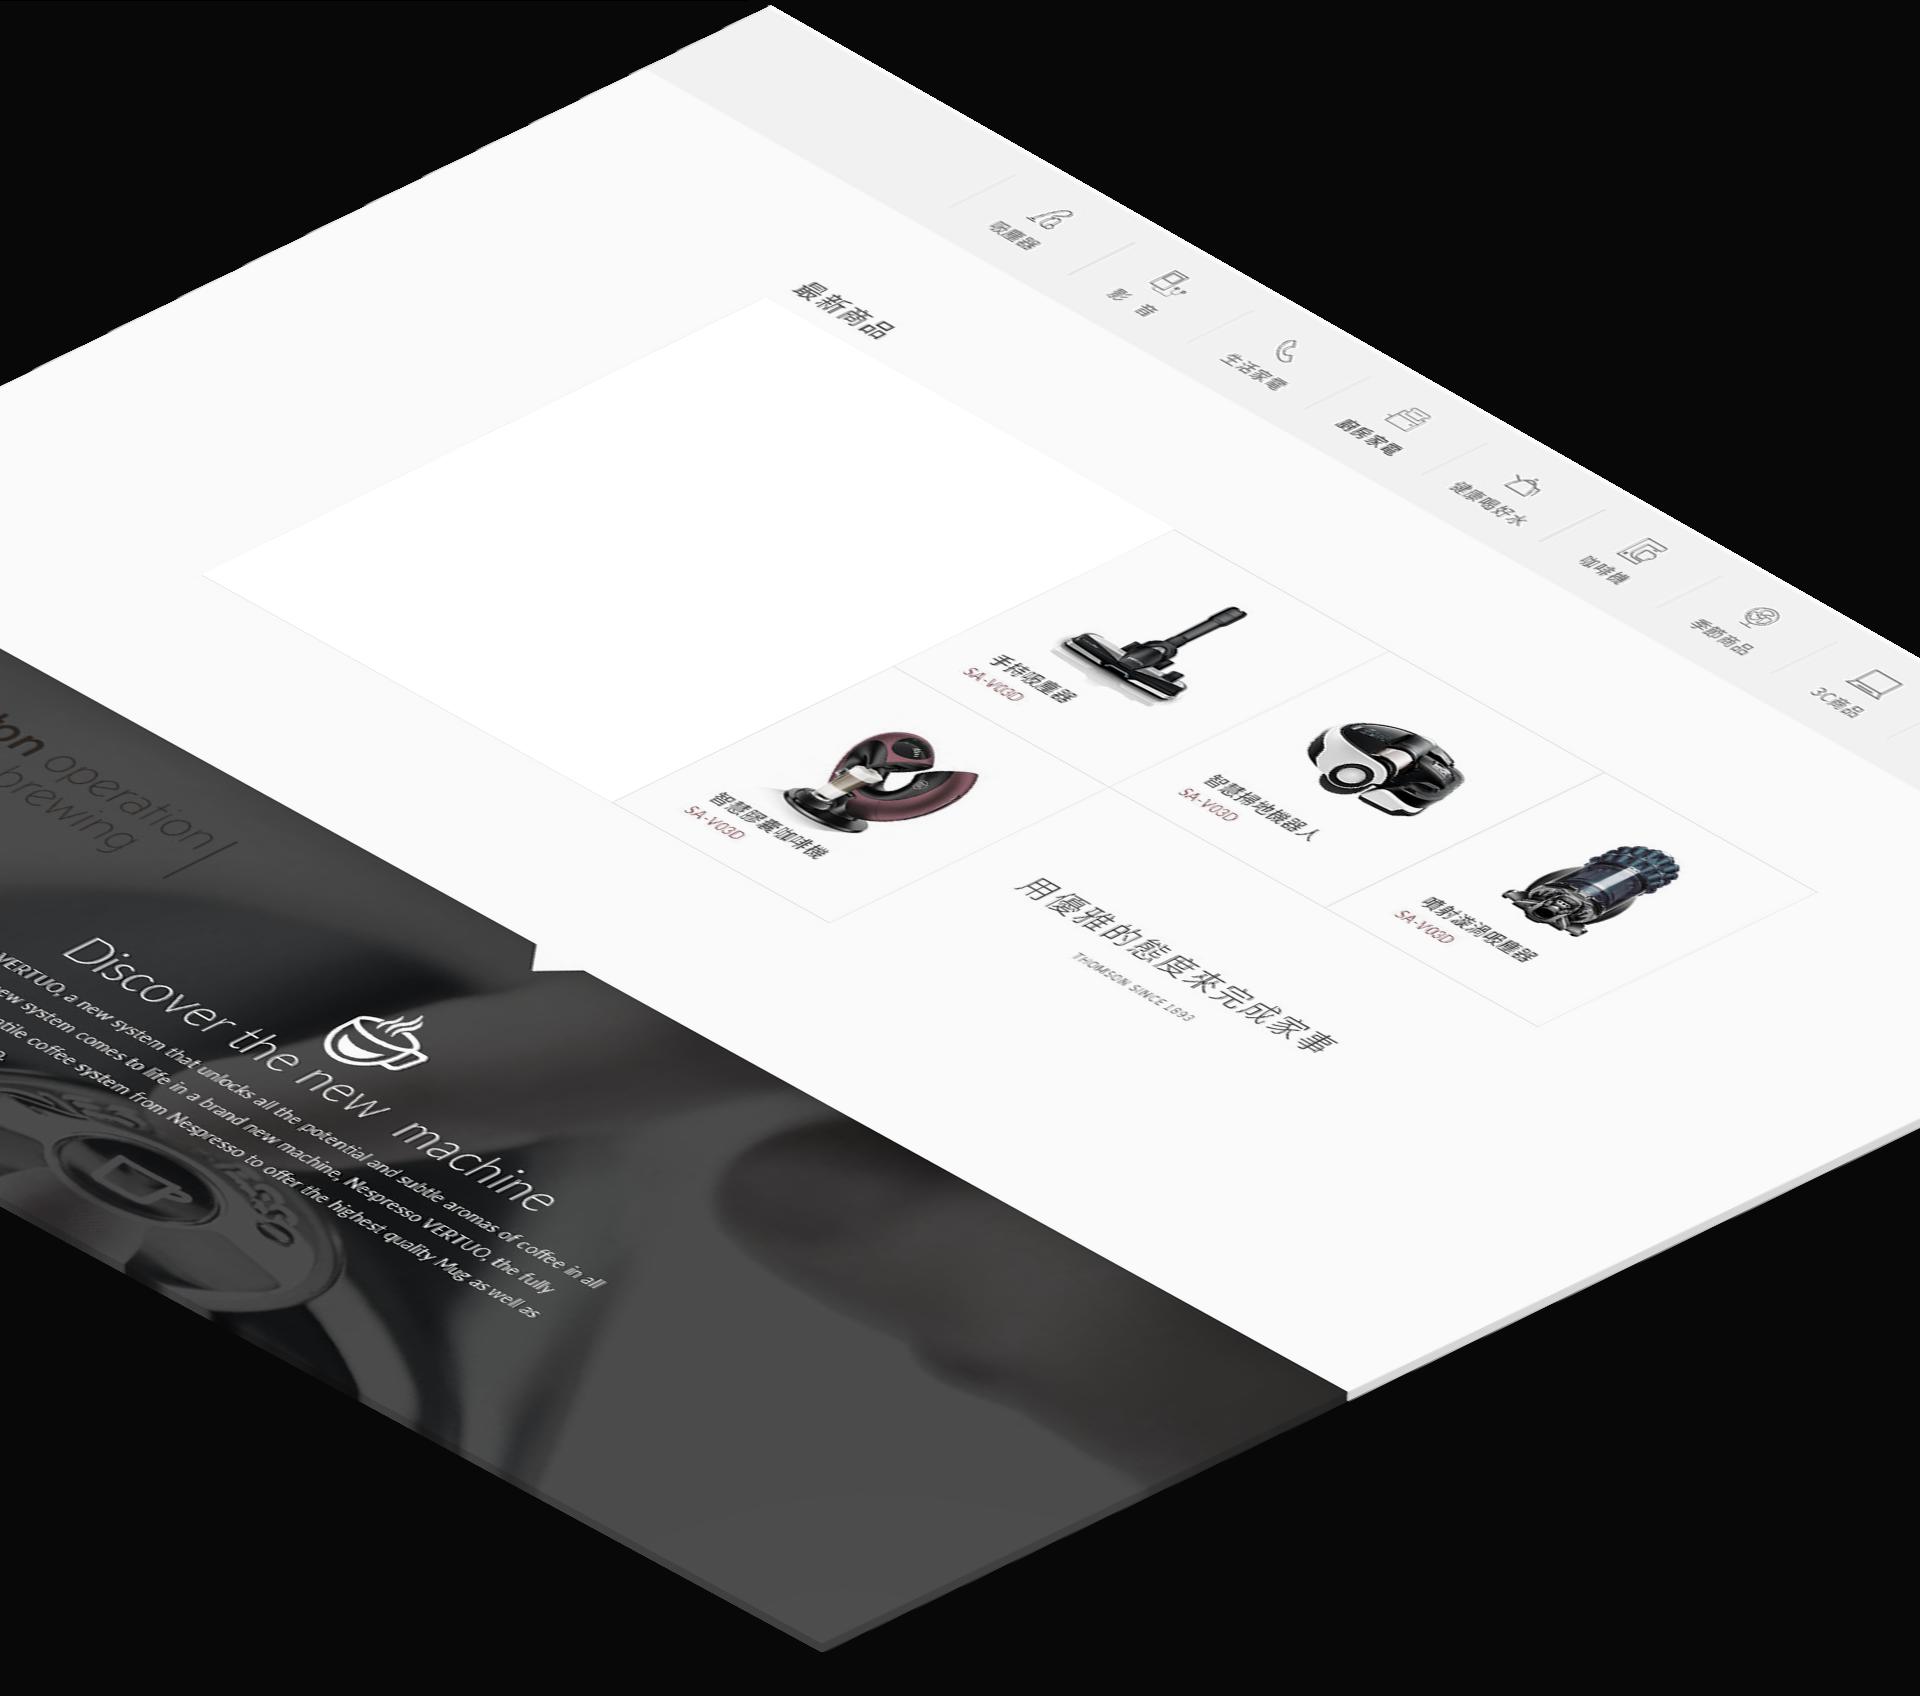 design_detail1